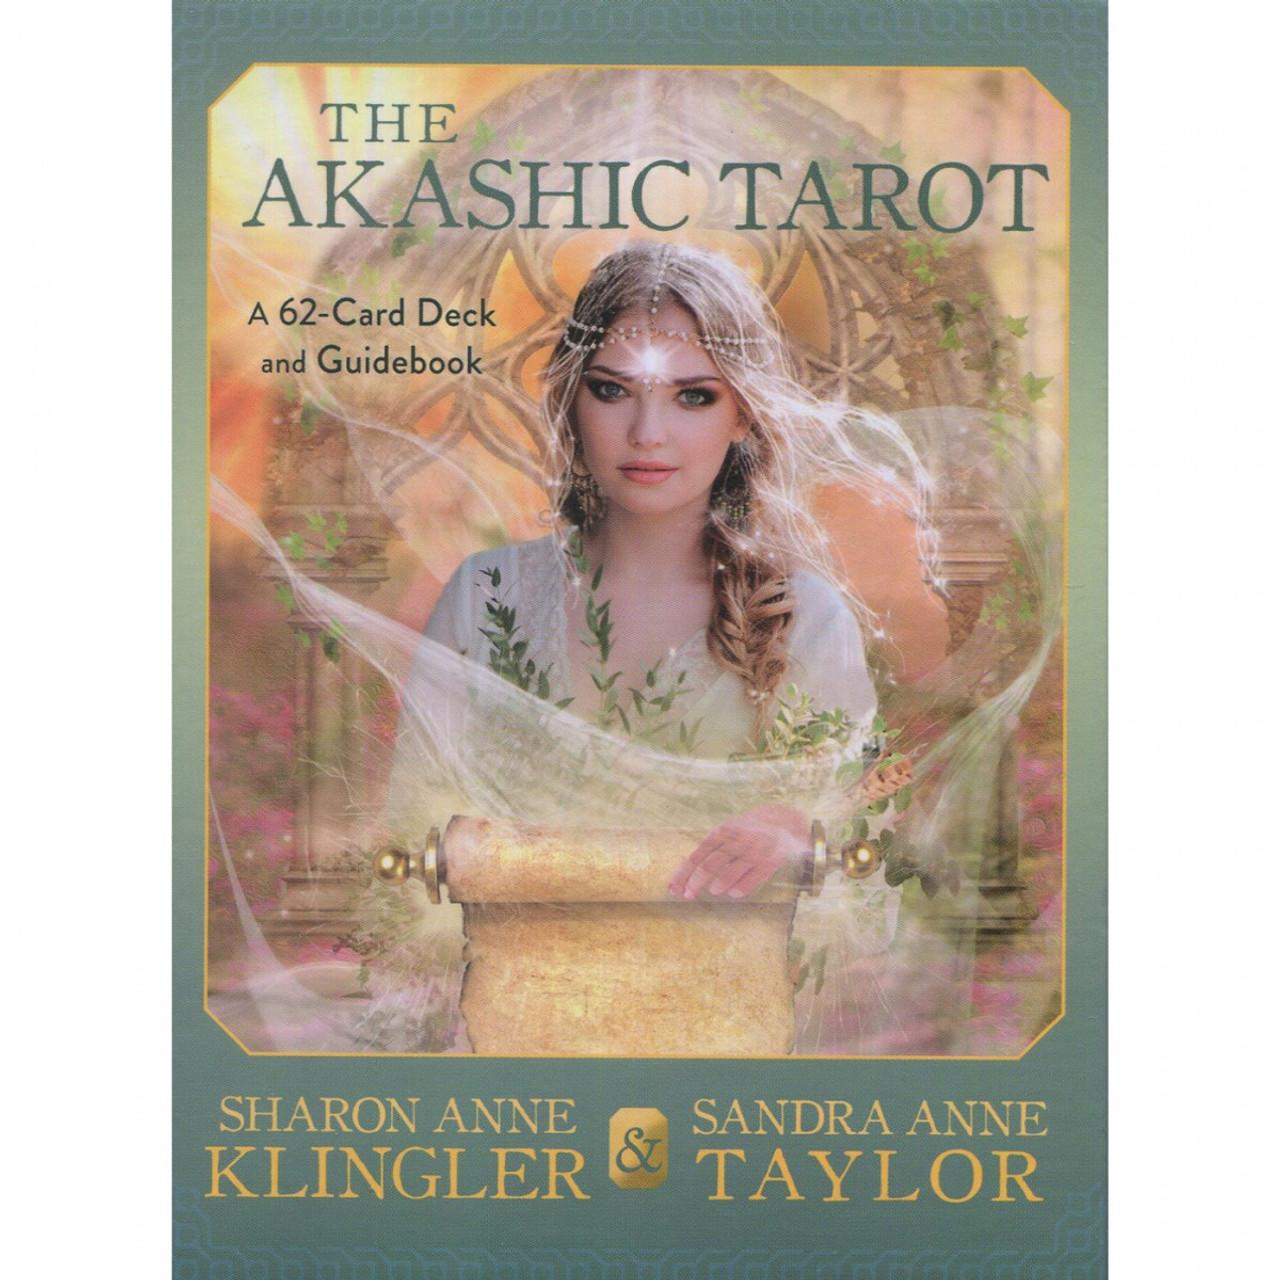 The Akashic Tarot by Sharon Anne Klingler